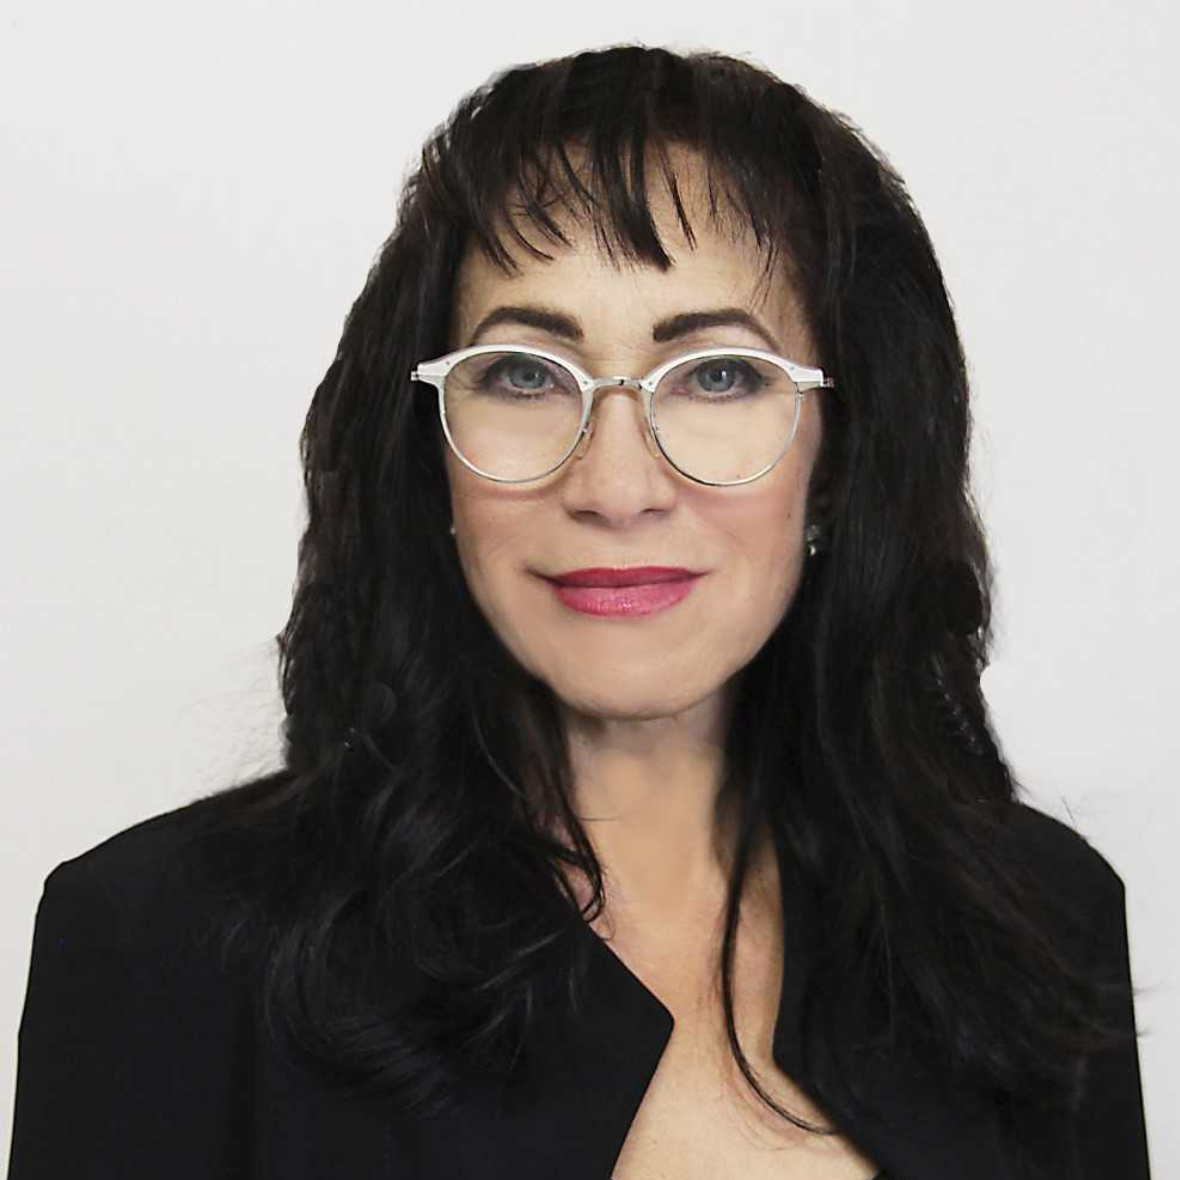 Suzanne Superka